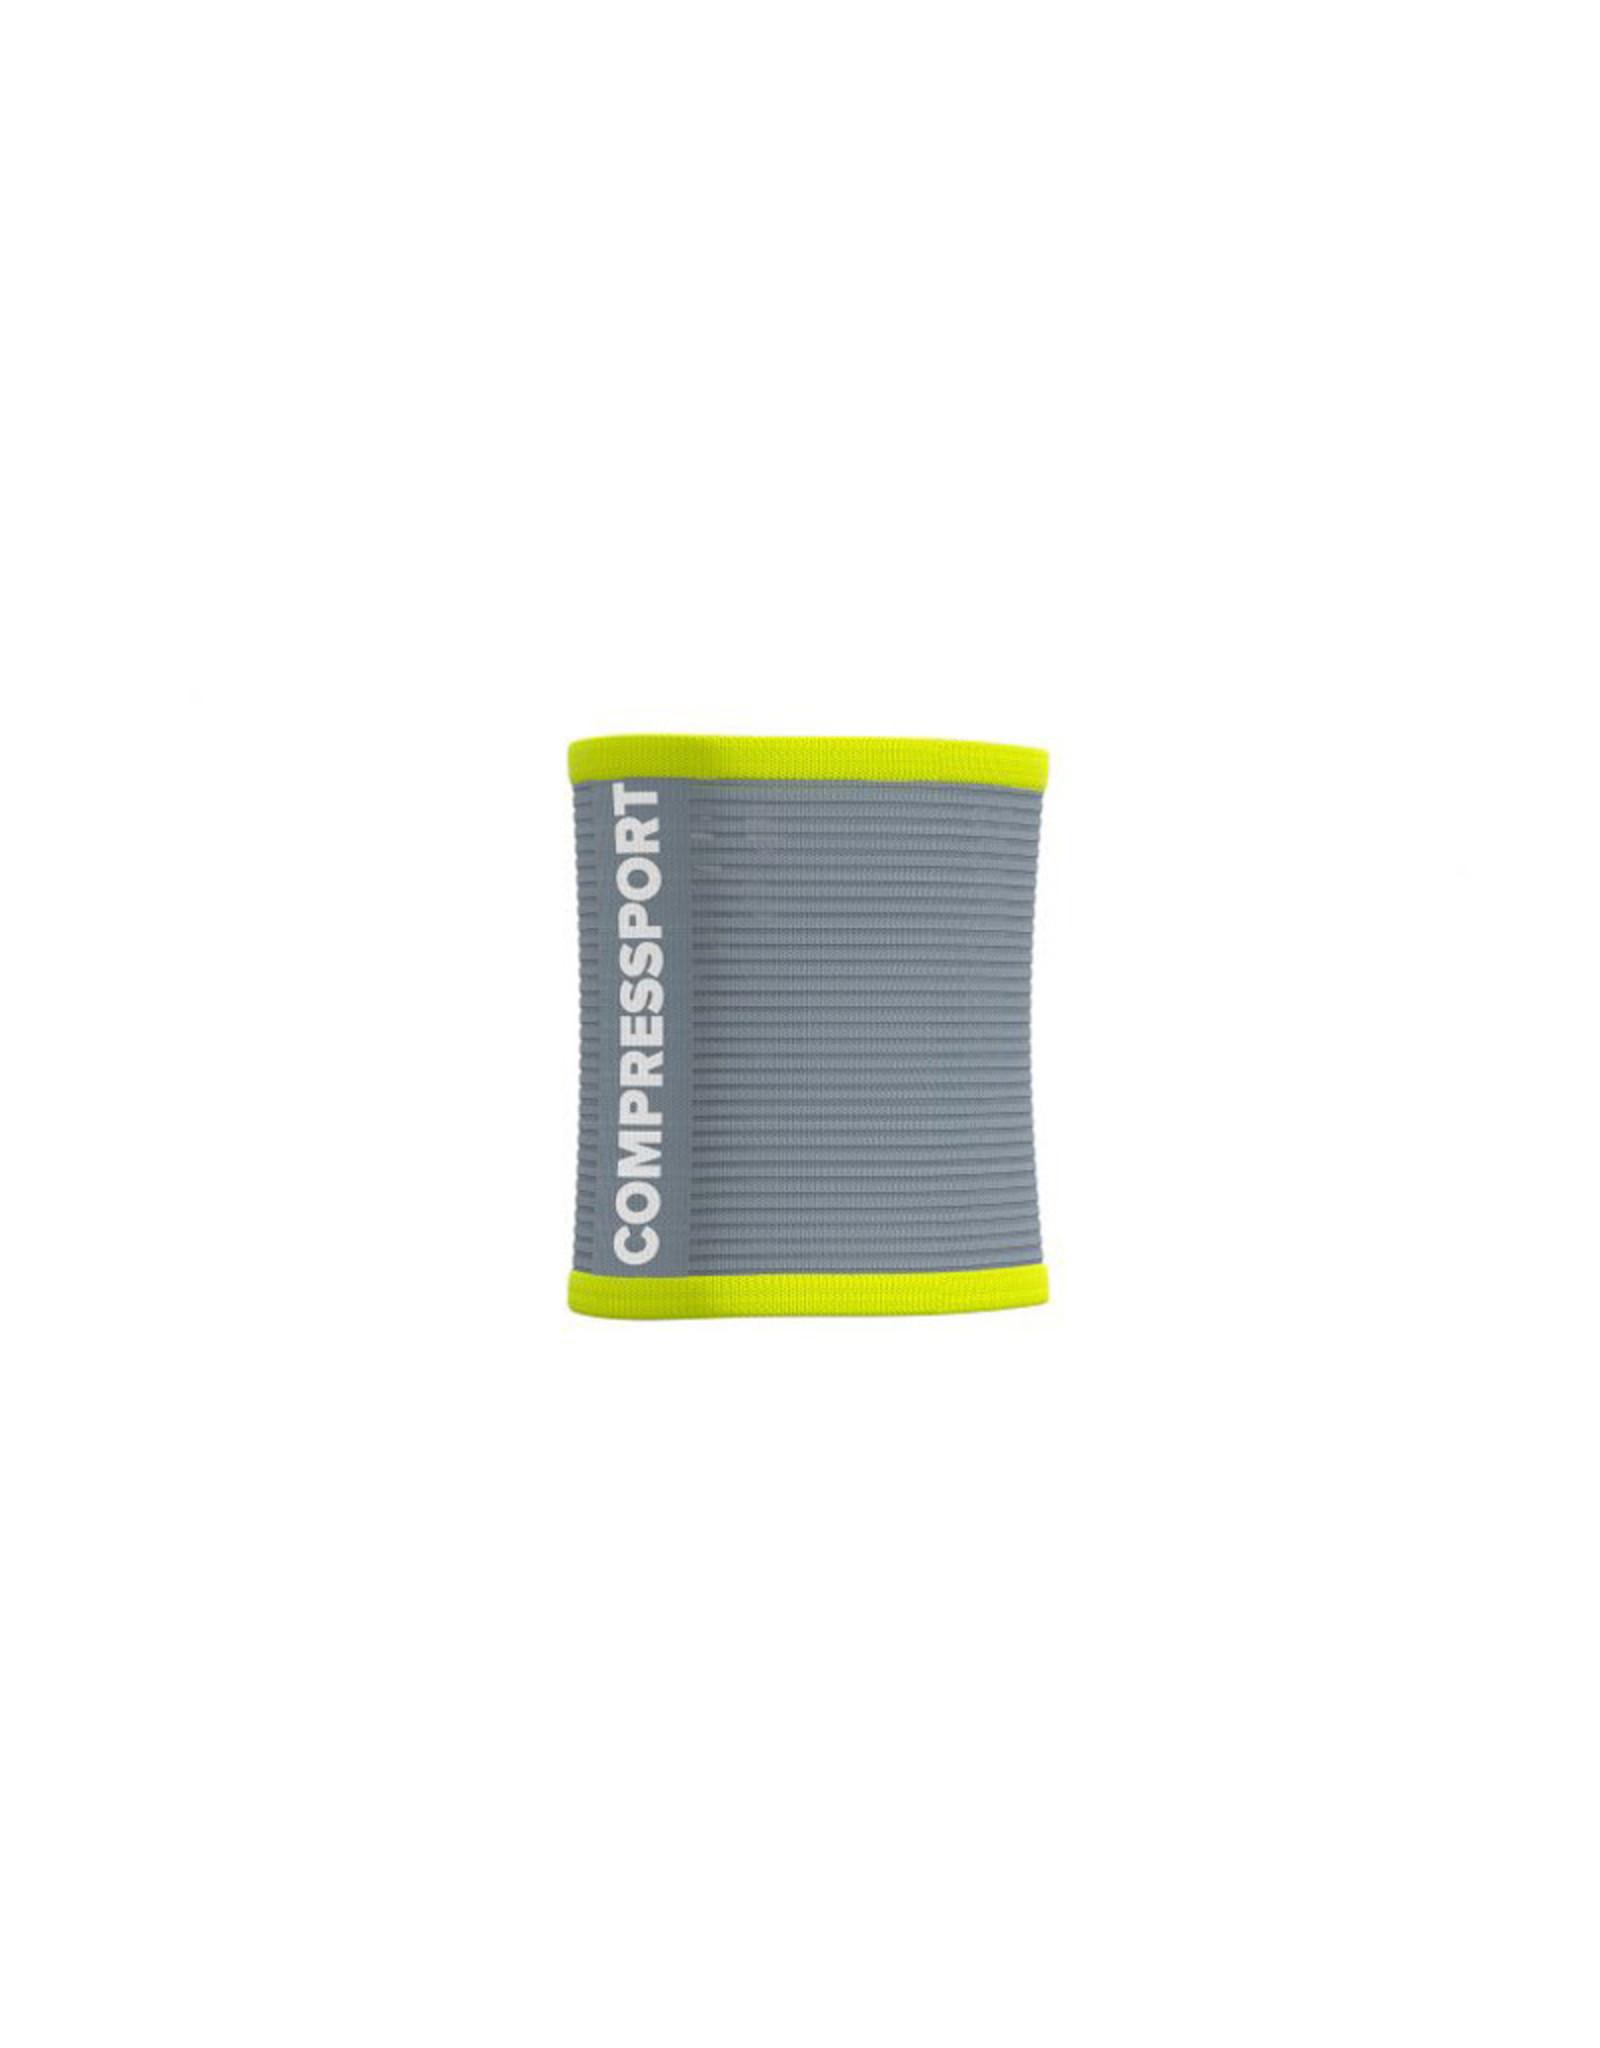 Compressport Sweatbands 3D.Dots - Gris/Jaune